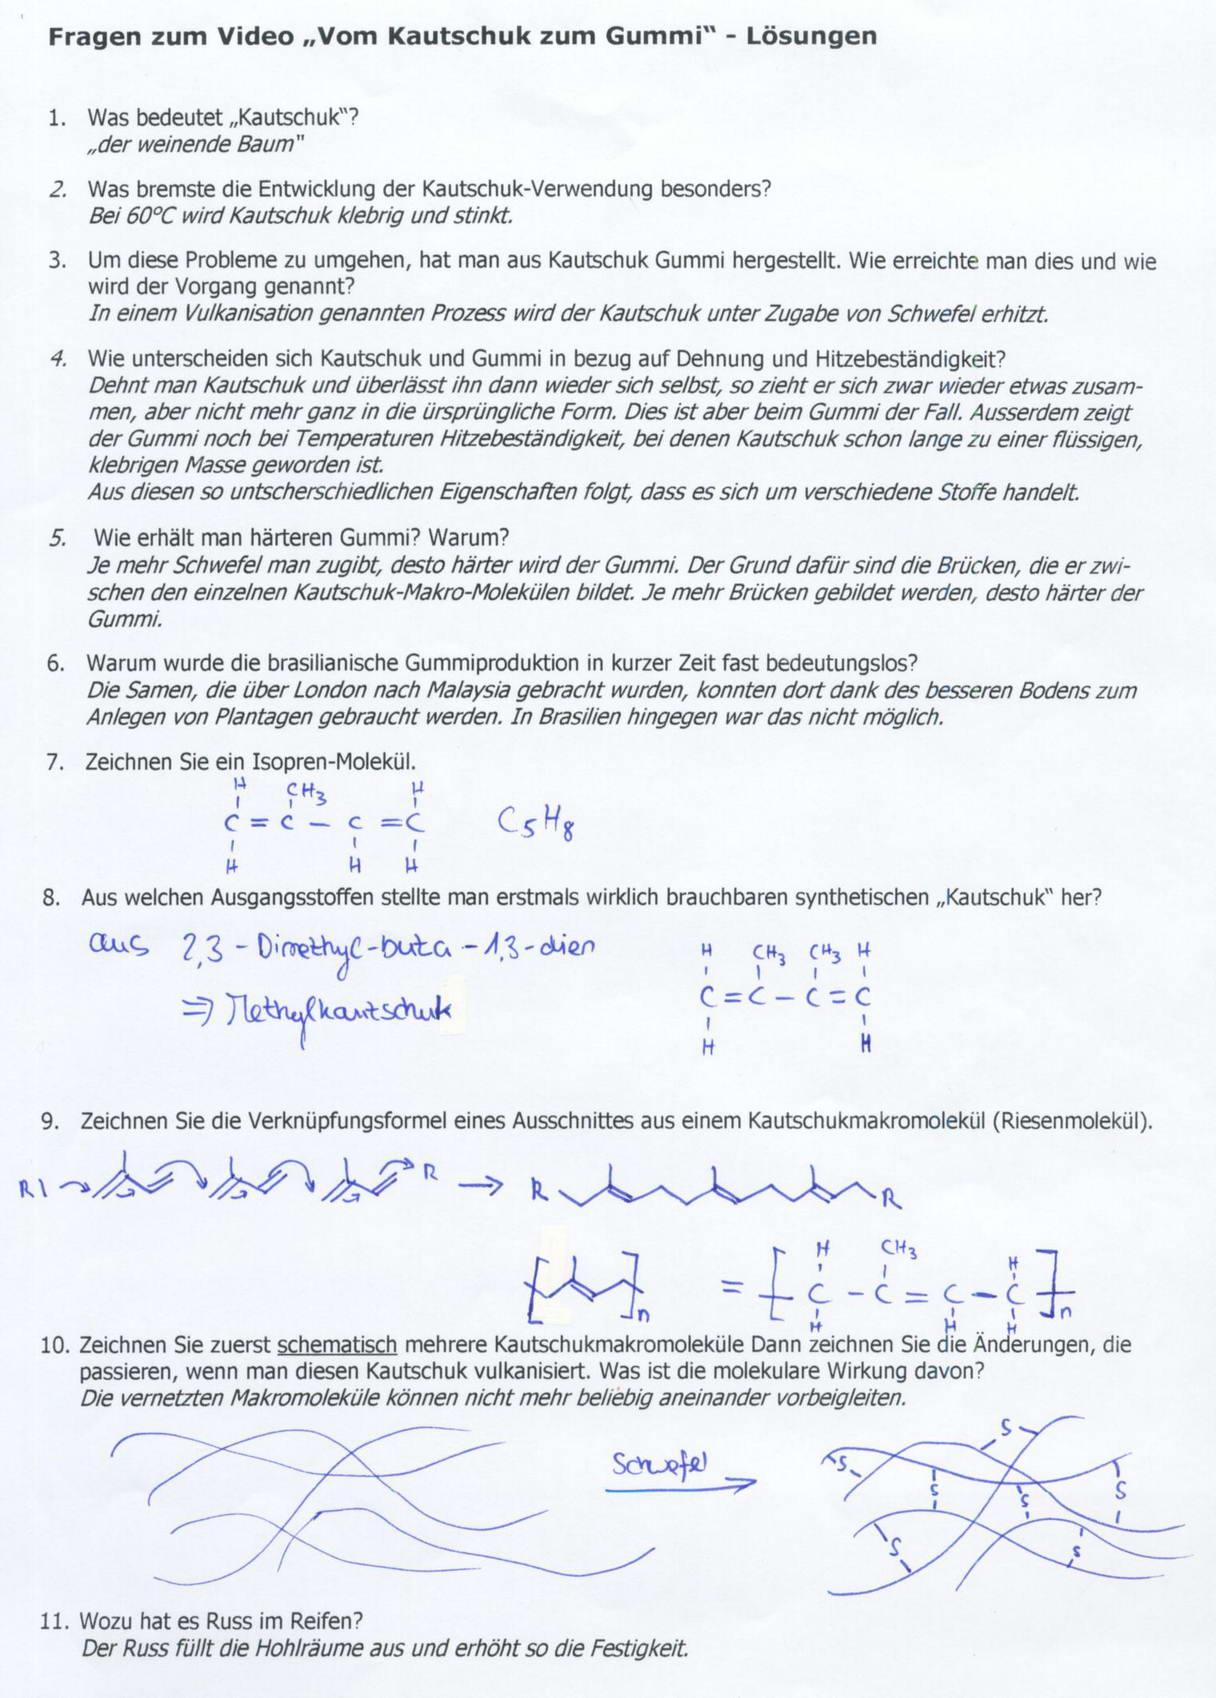 Chemie MNG Rämibühl (Marti) Downloads